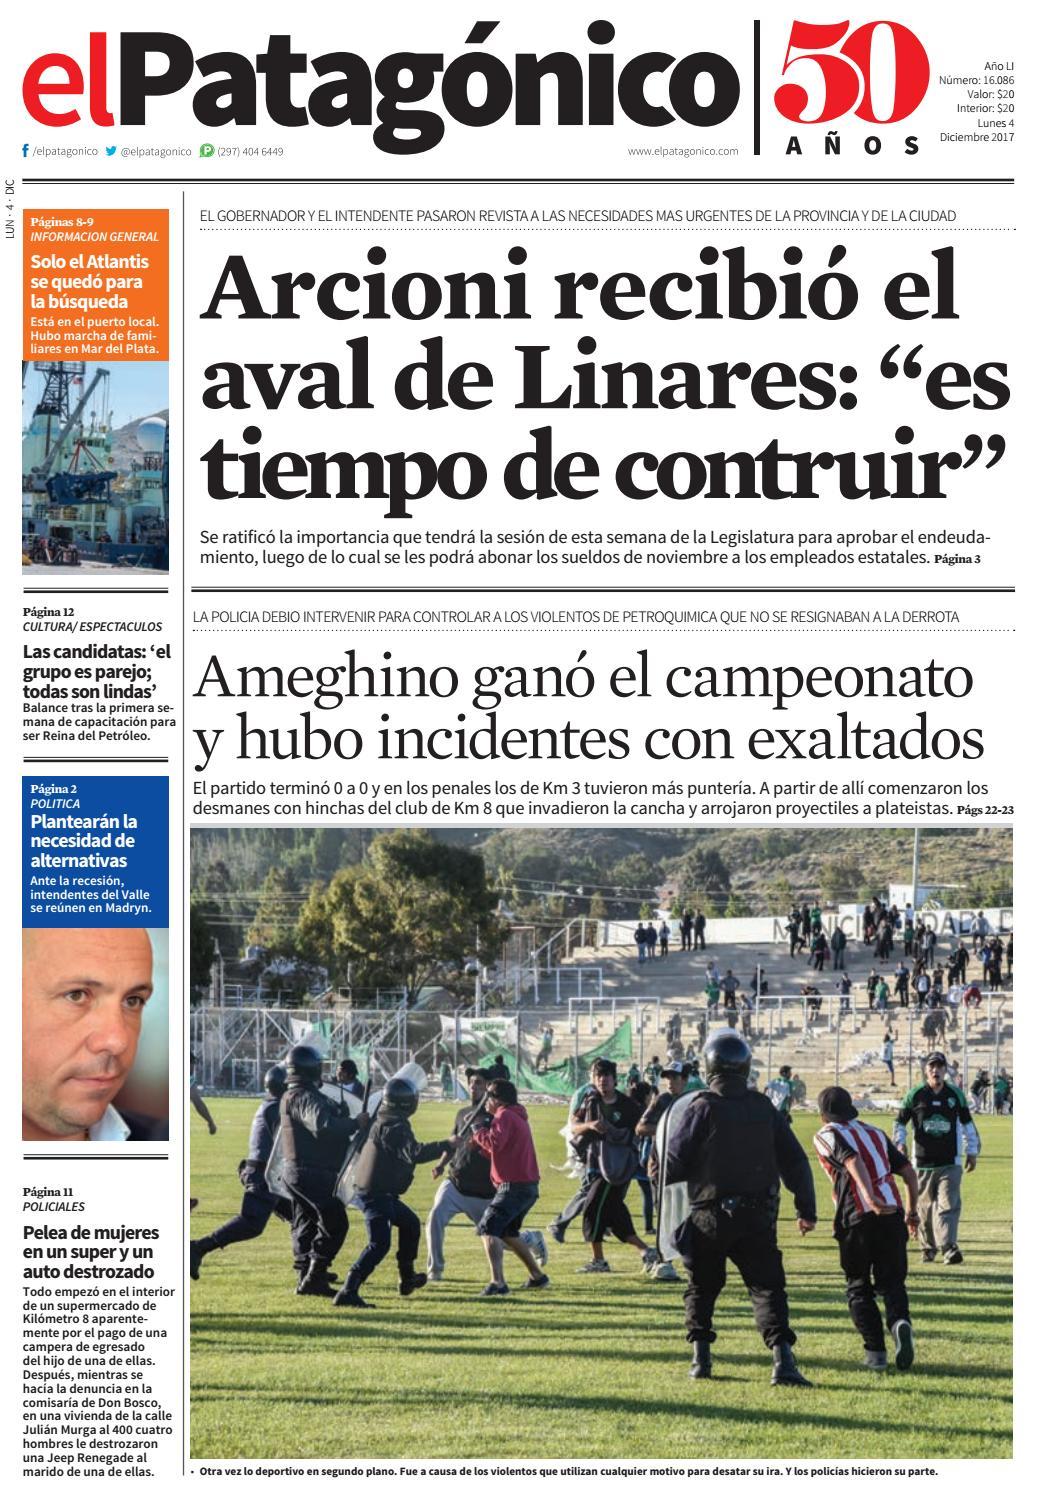 edicion222803122017.pdf by El Patagonico - issuu 8ac2b3a4248e5